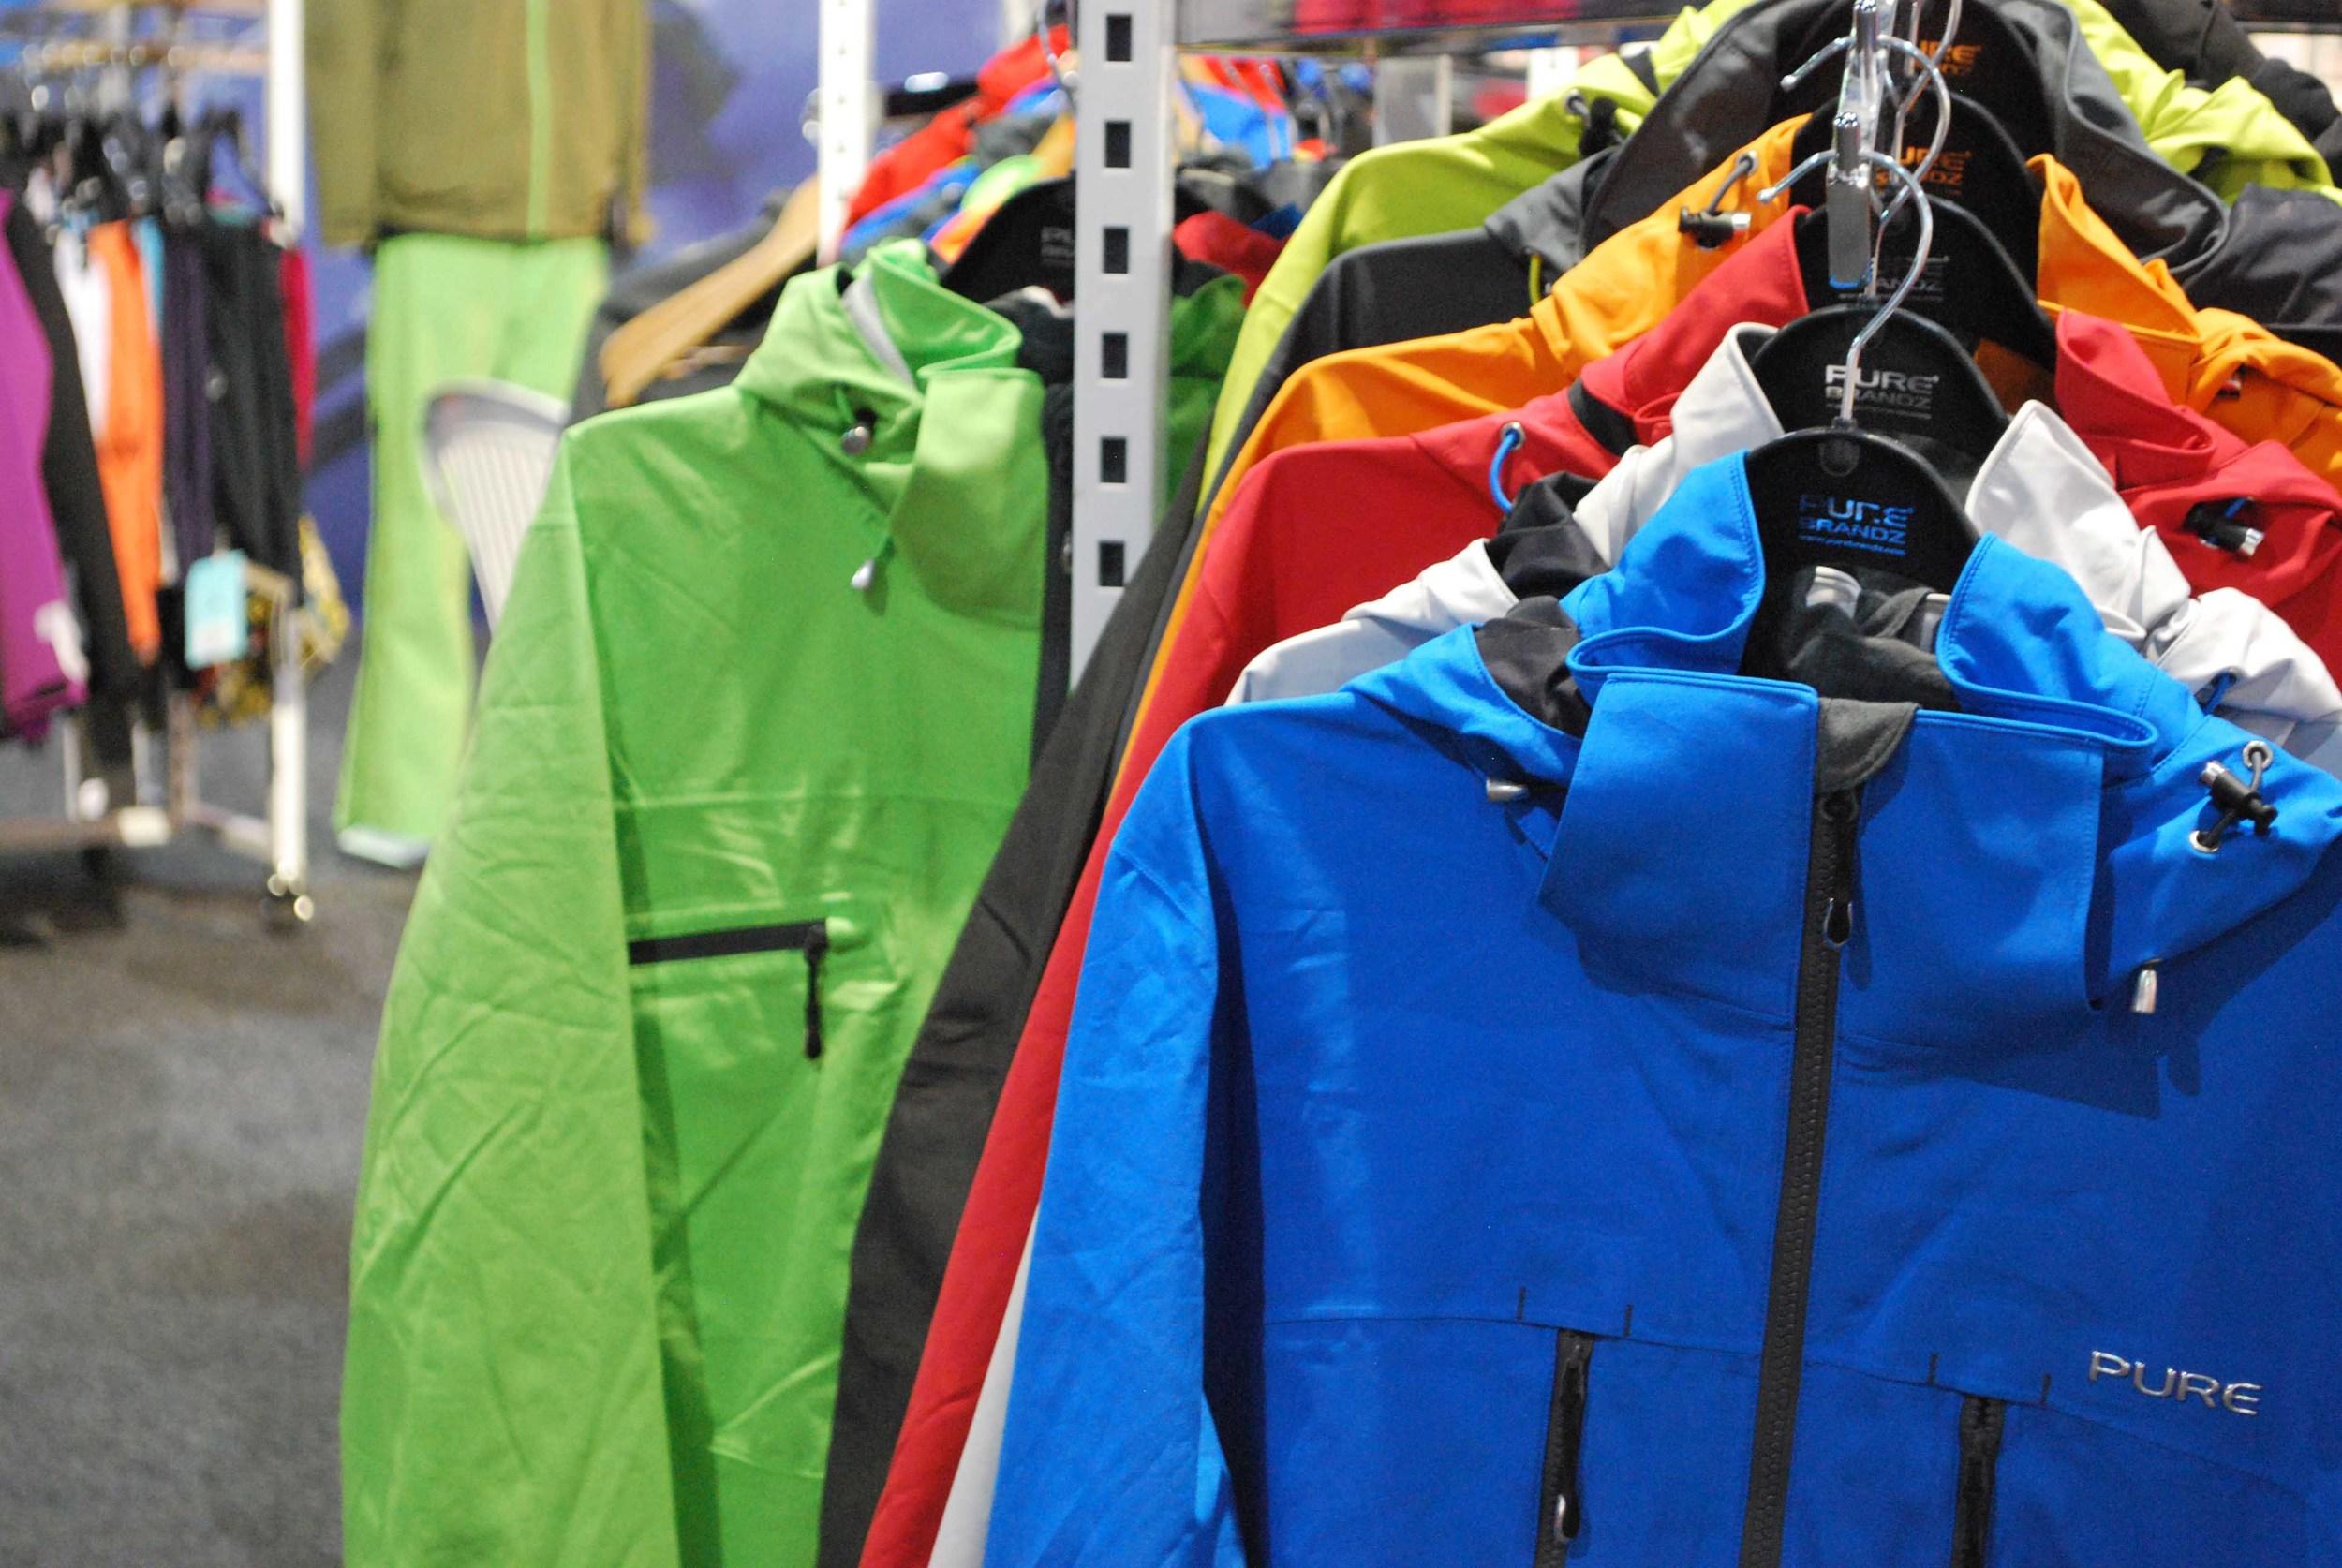 Pure Brandz jacket rack